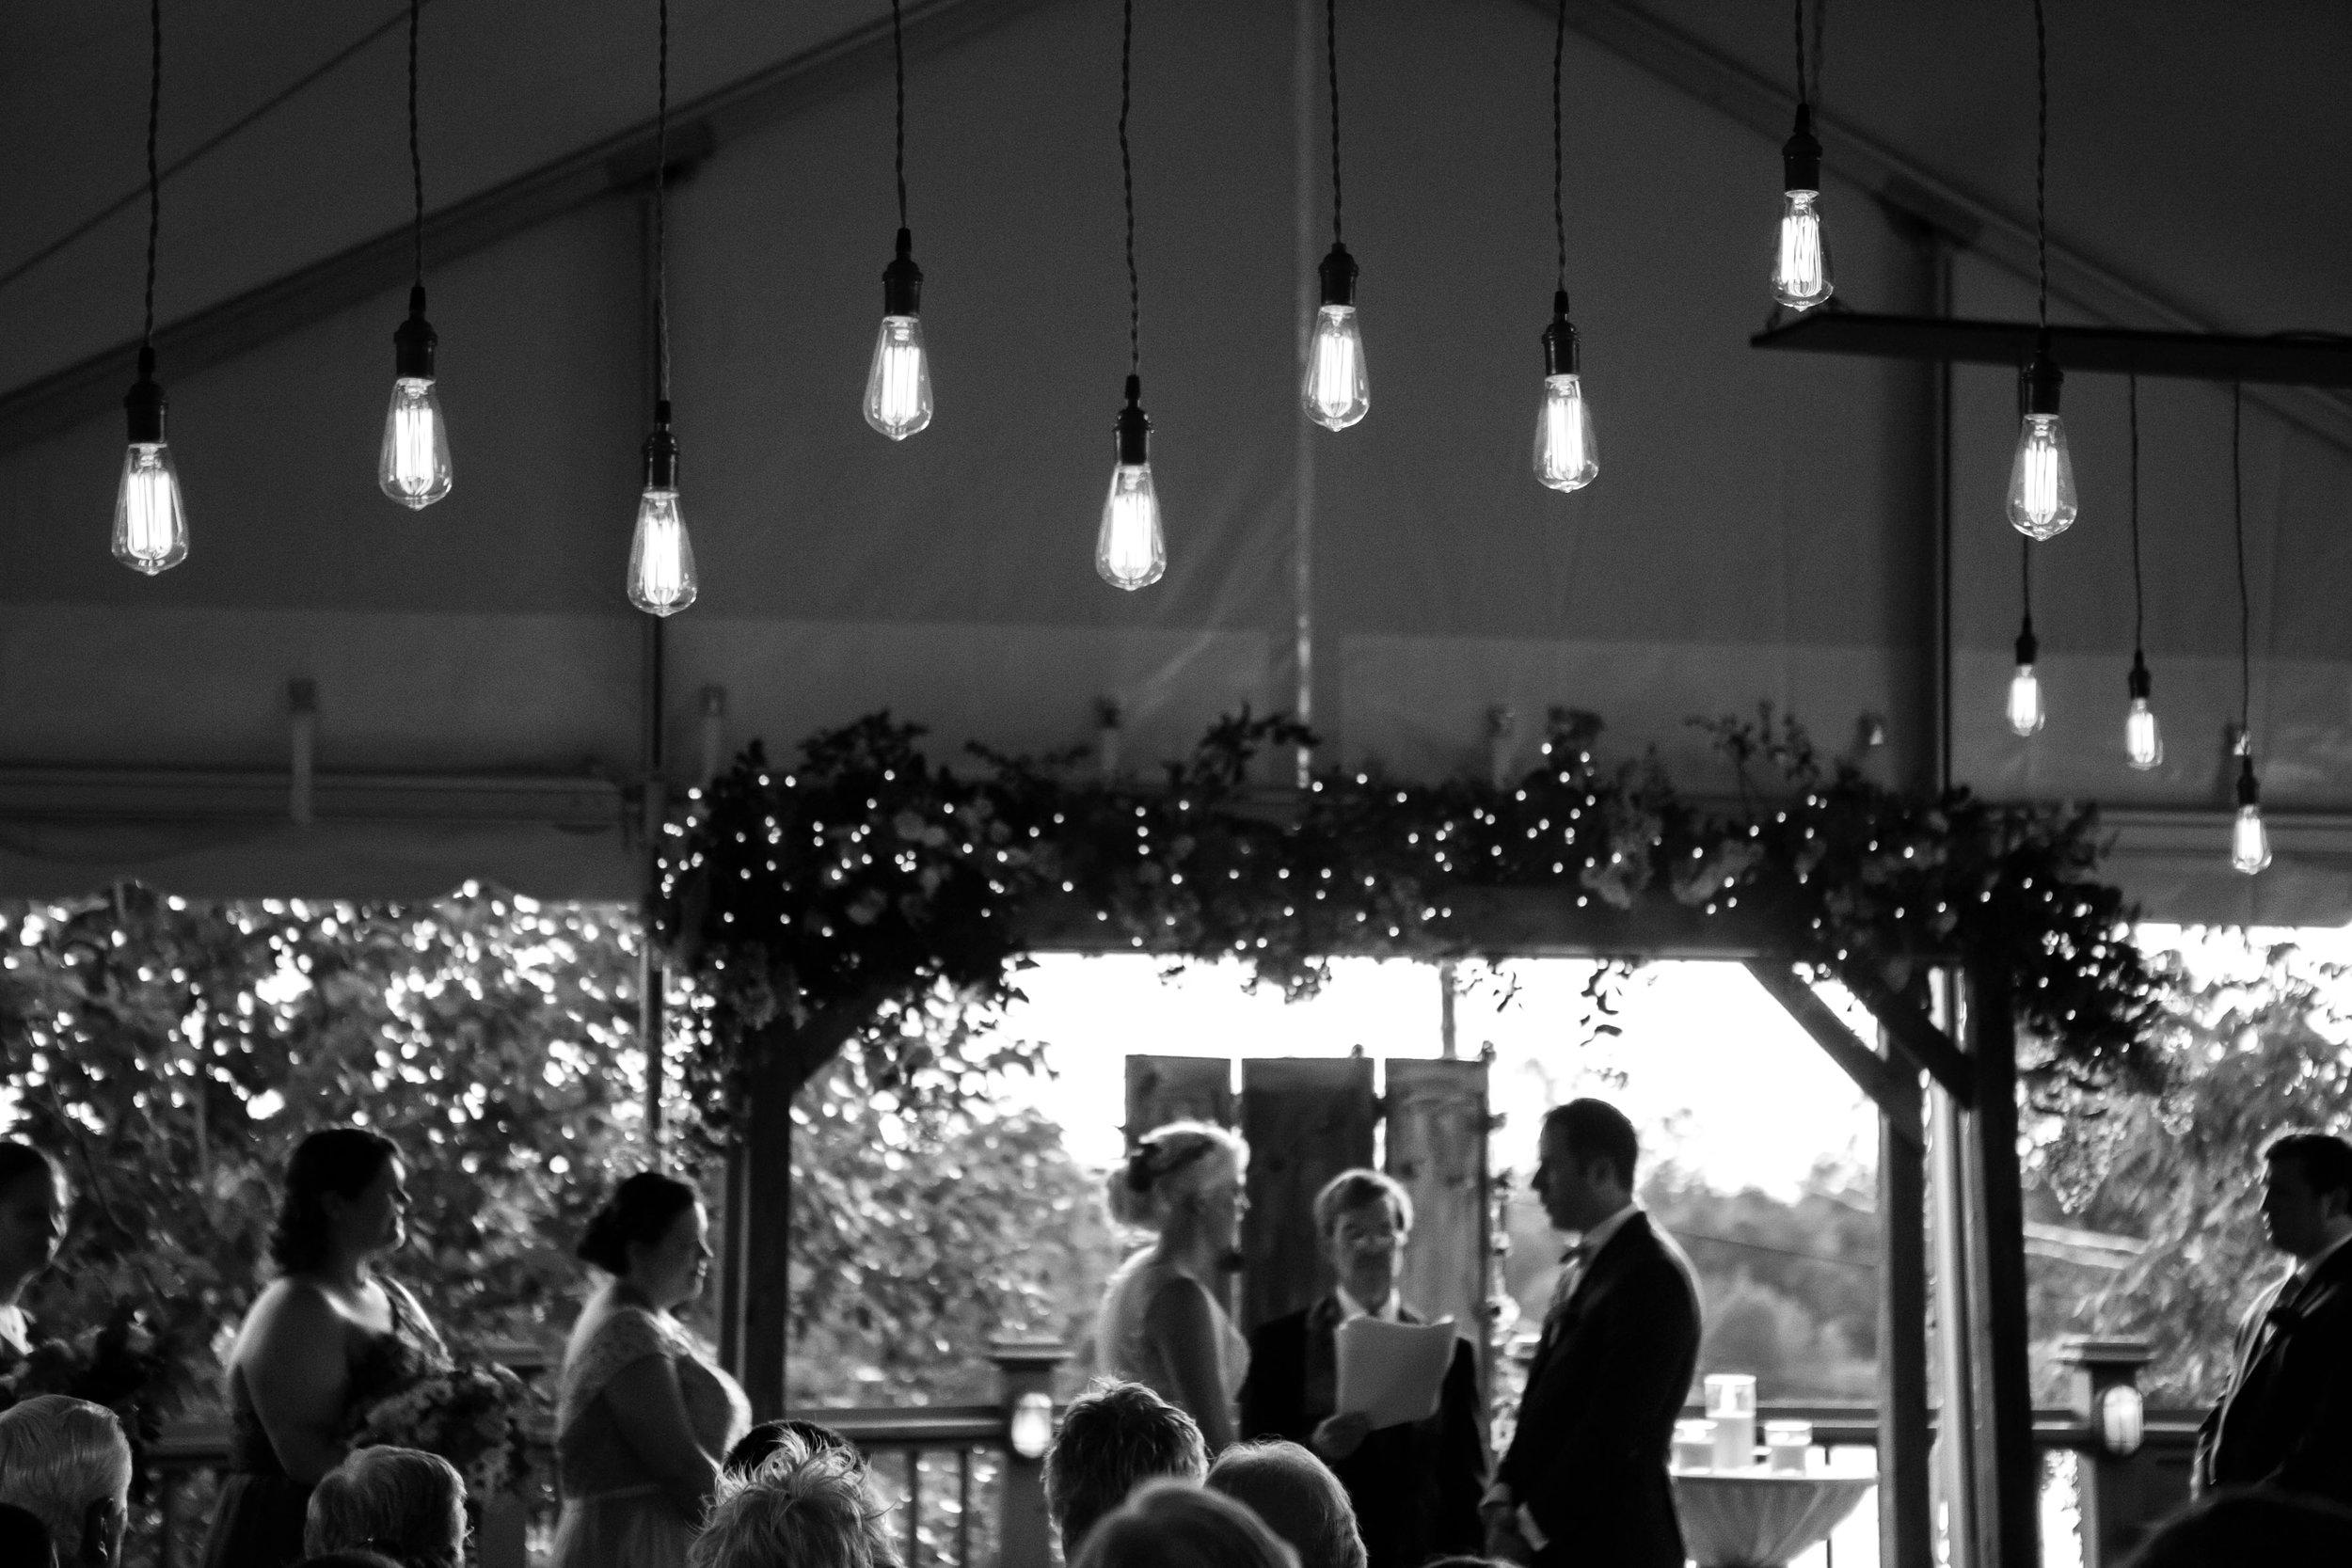 128-South-Wedding-Wilmington-NC-Photographer-Ceremony-014.1.jpg